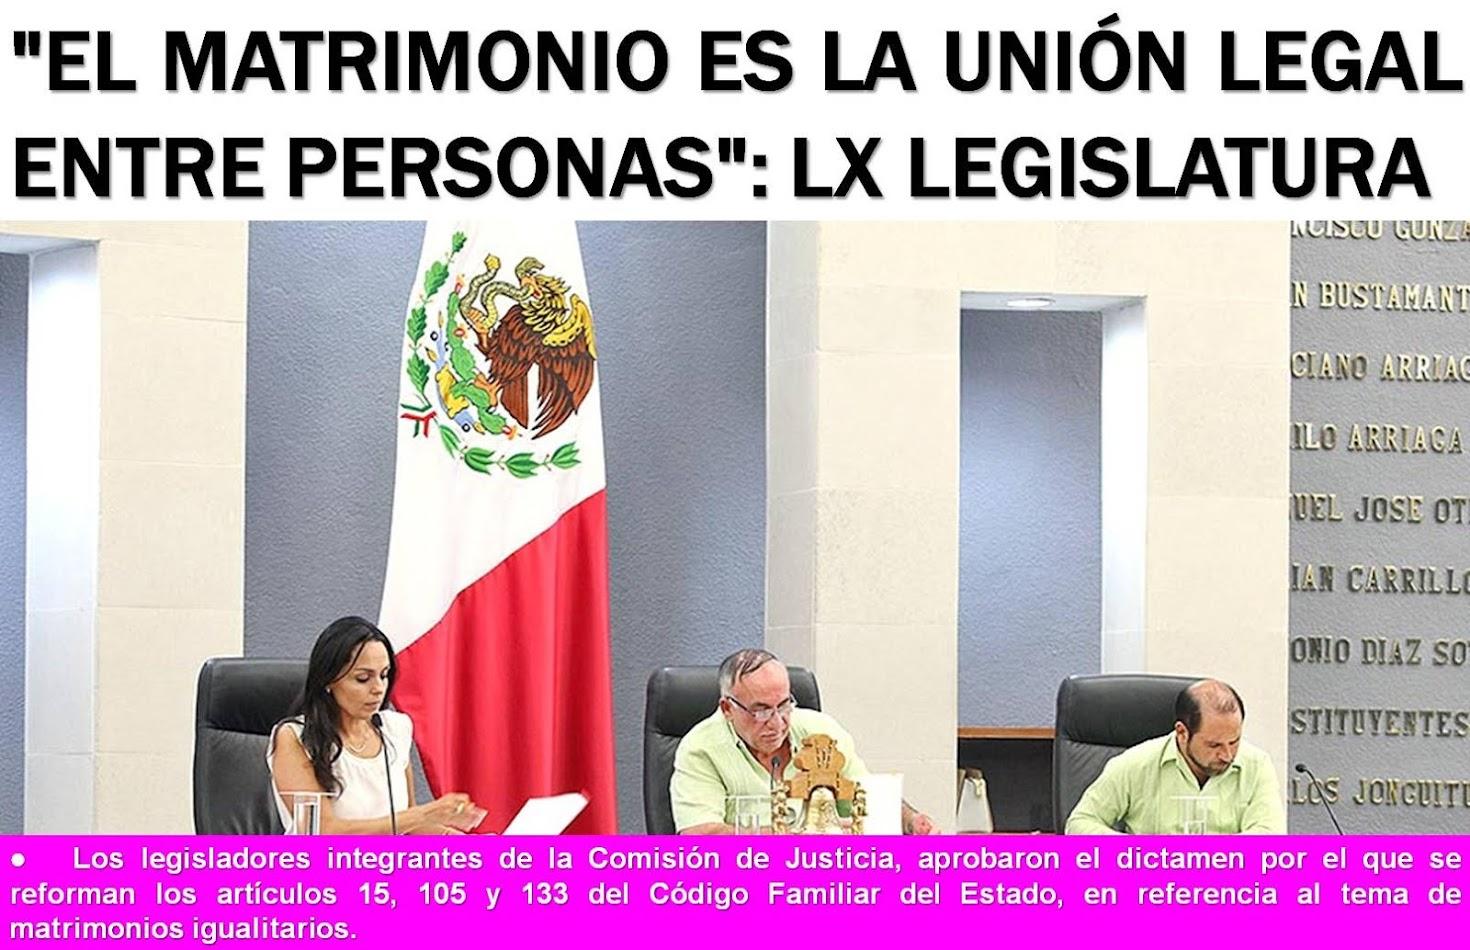 LA LX LEGISLATURA: UN PODER CIUDADANO